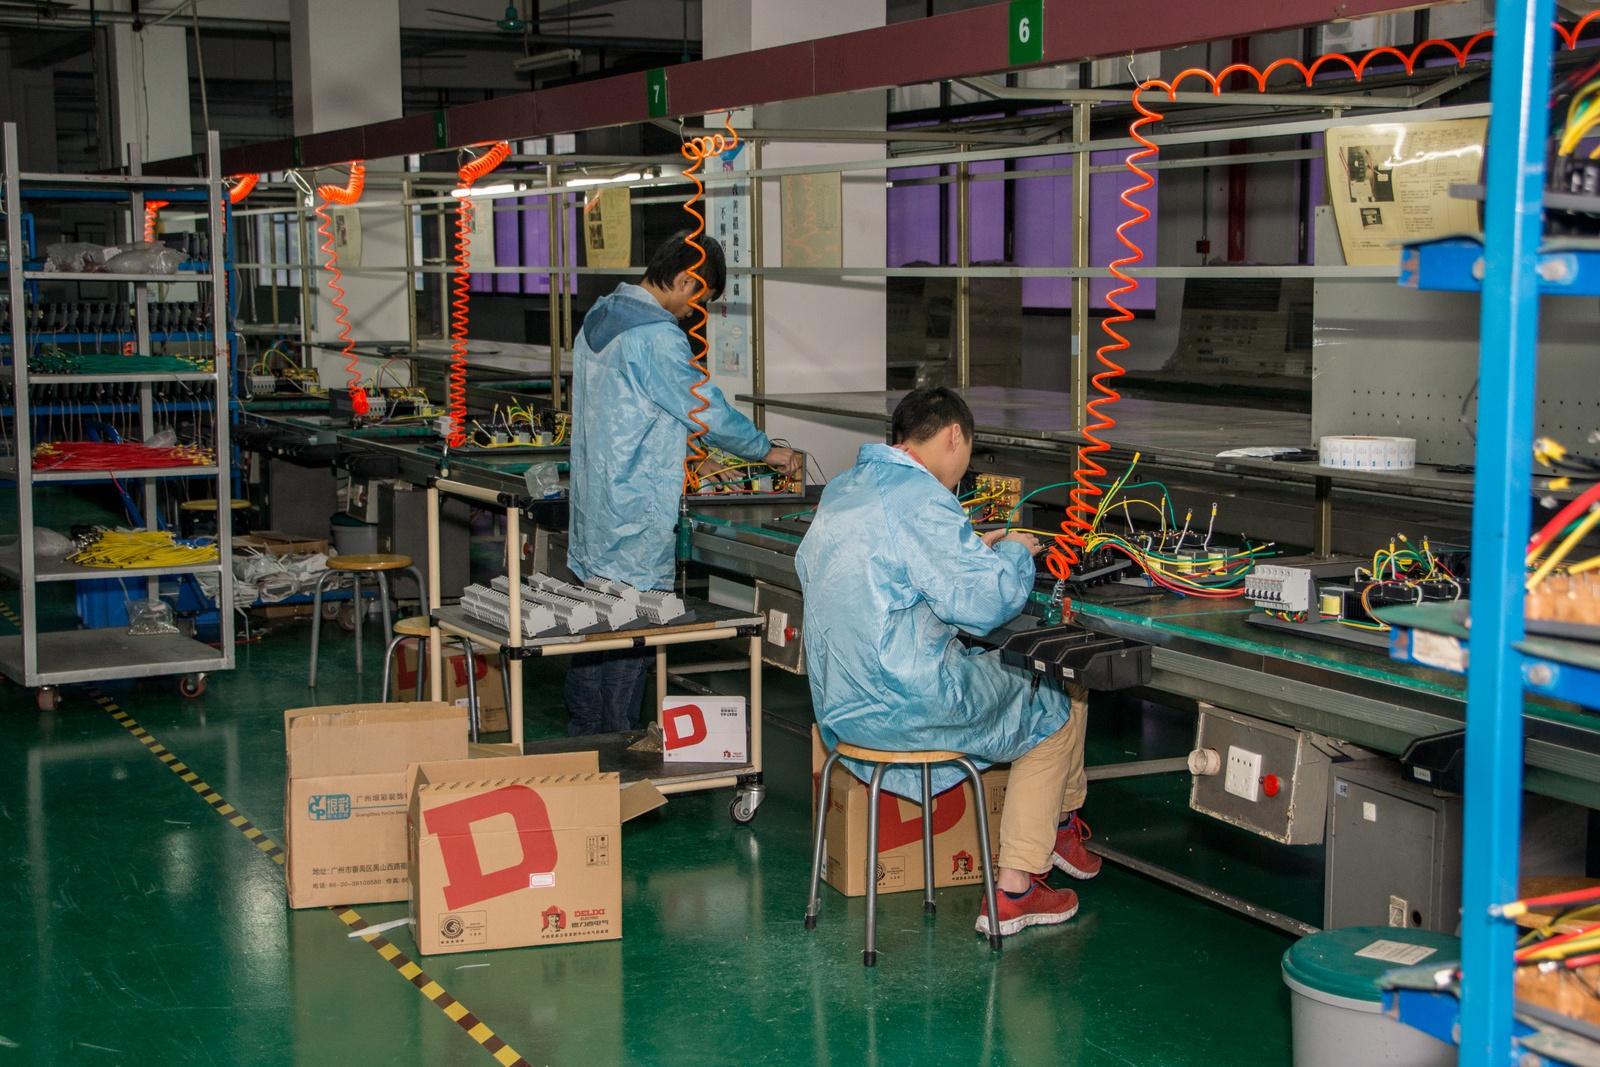 Китай. Завод устройств для «Умного дома». Учимся и учим - 34